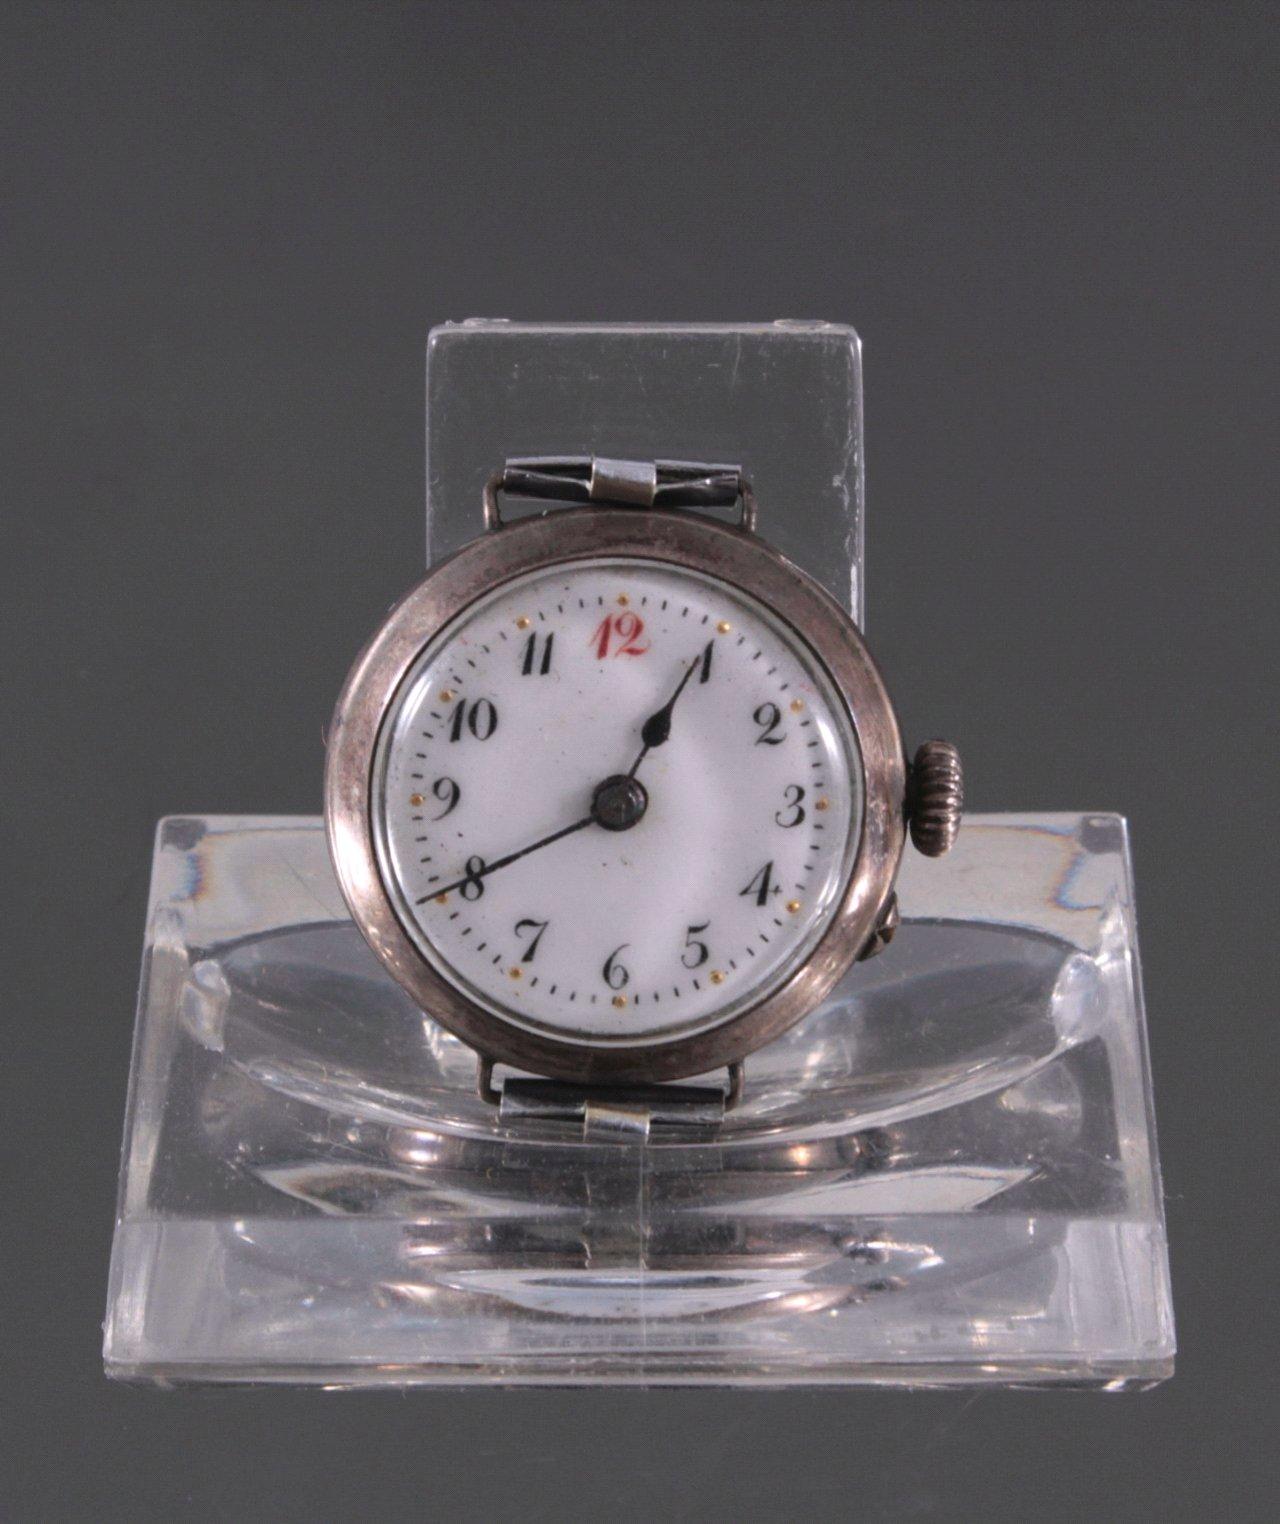 Damen Armbanduhr um 1900